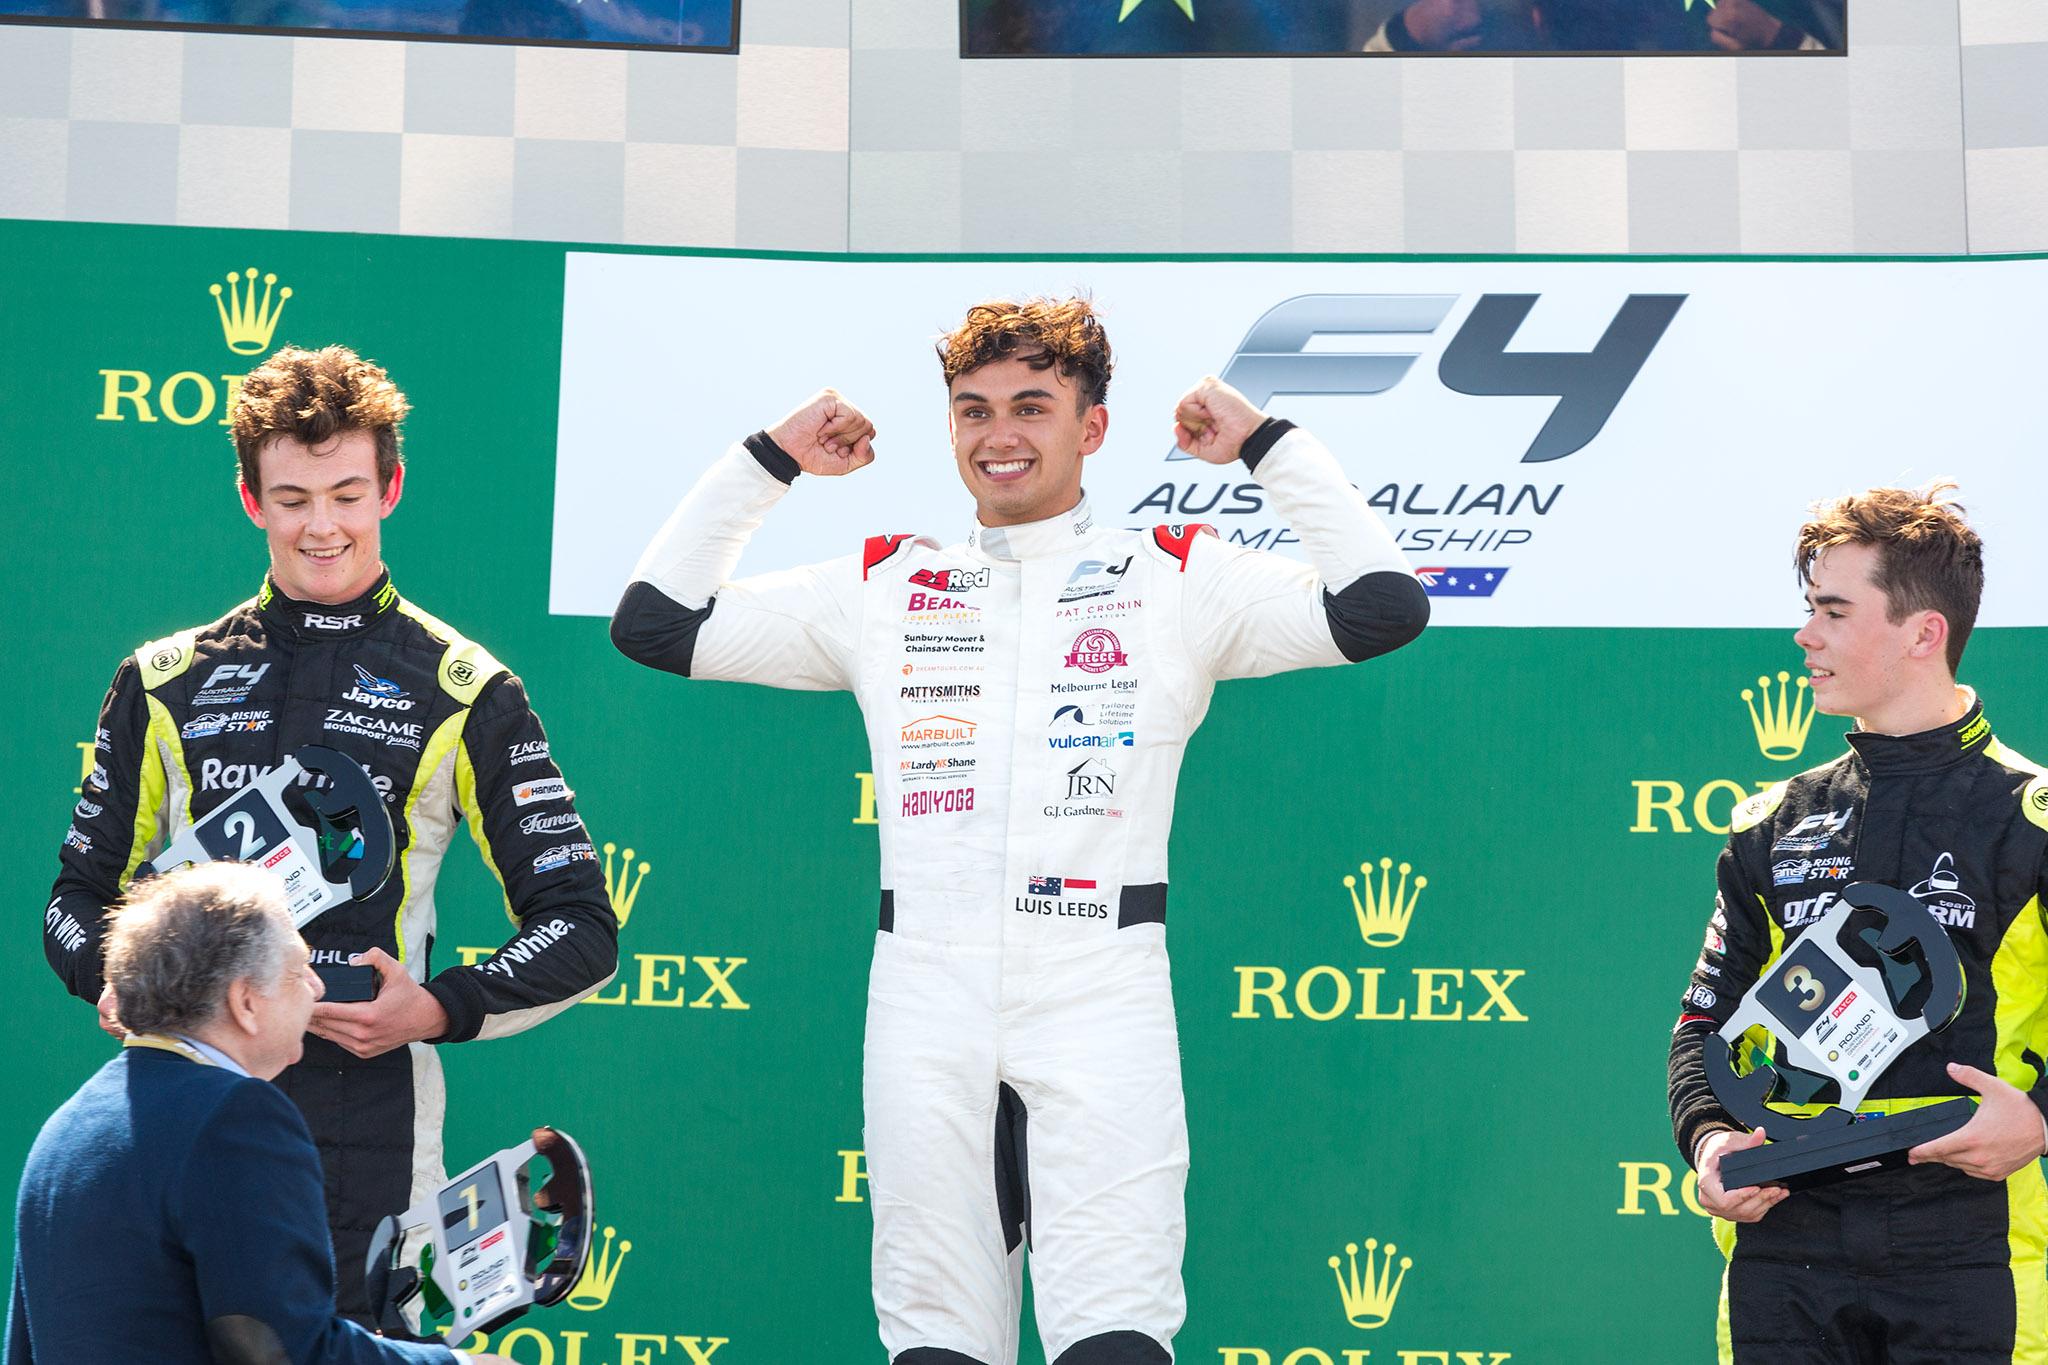 Luis Leeds celebrates a race victory at the Australian Grand Prix.